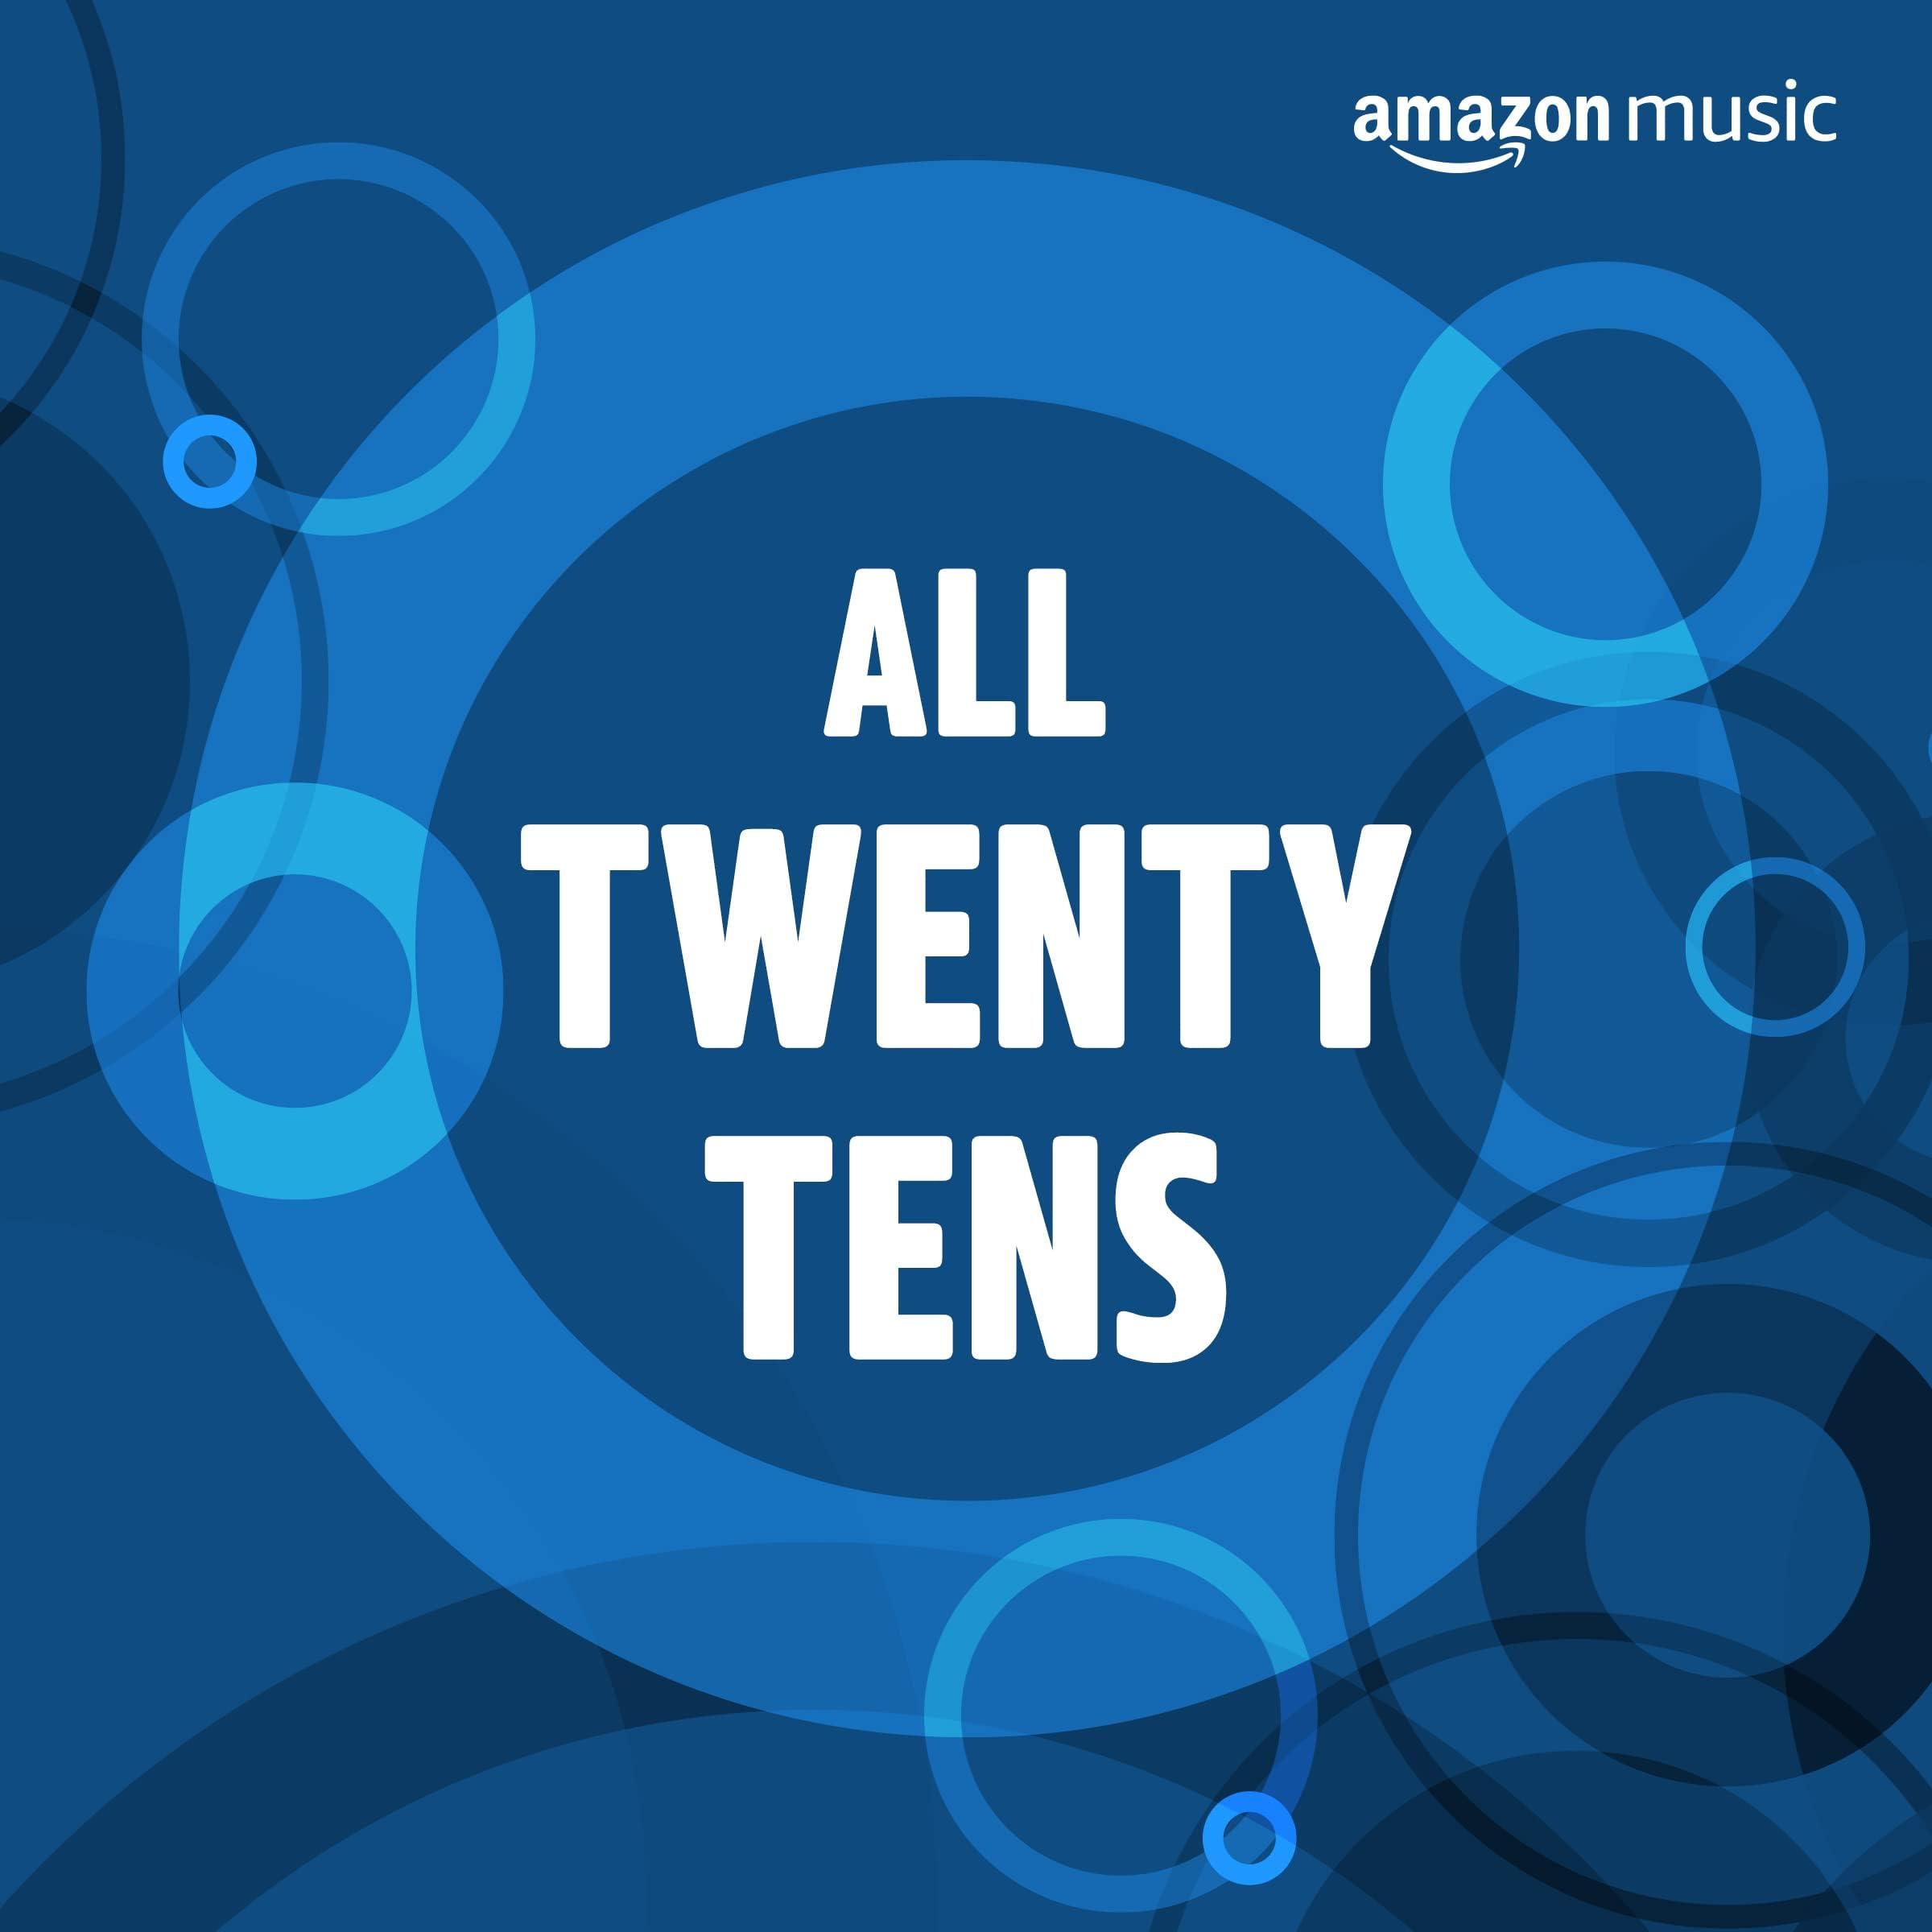 All Twenty Tens